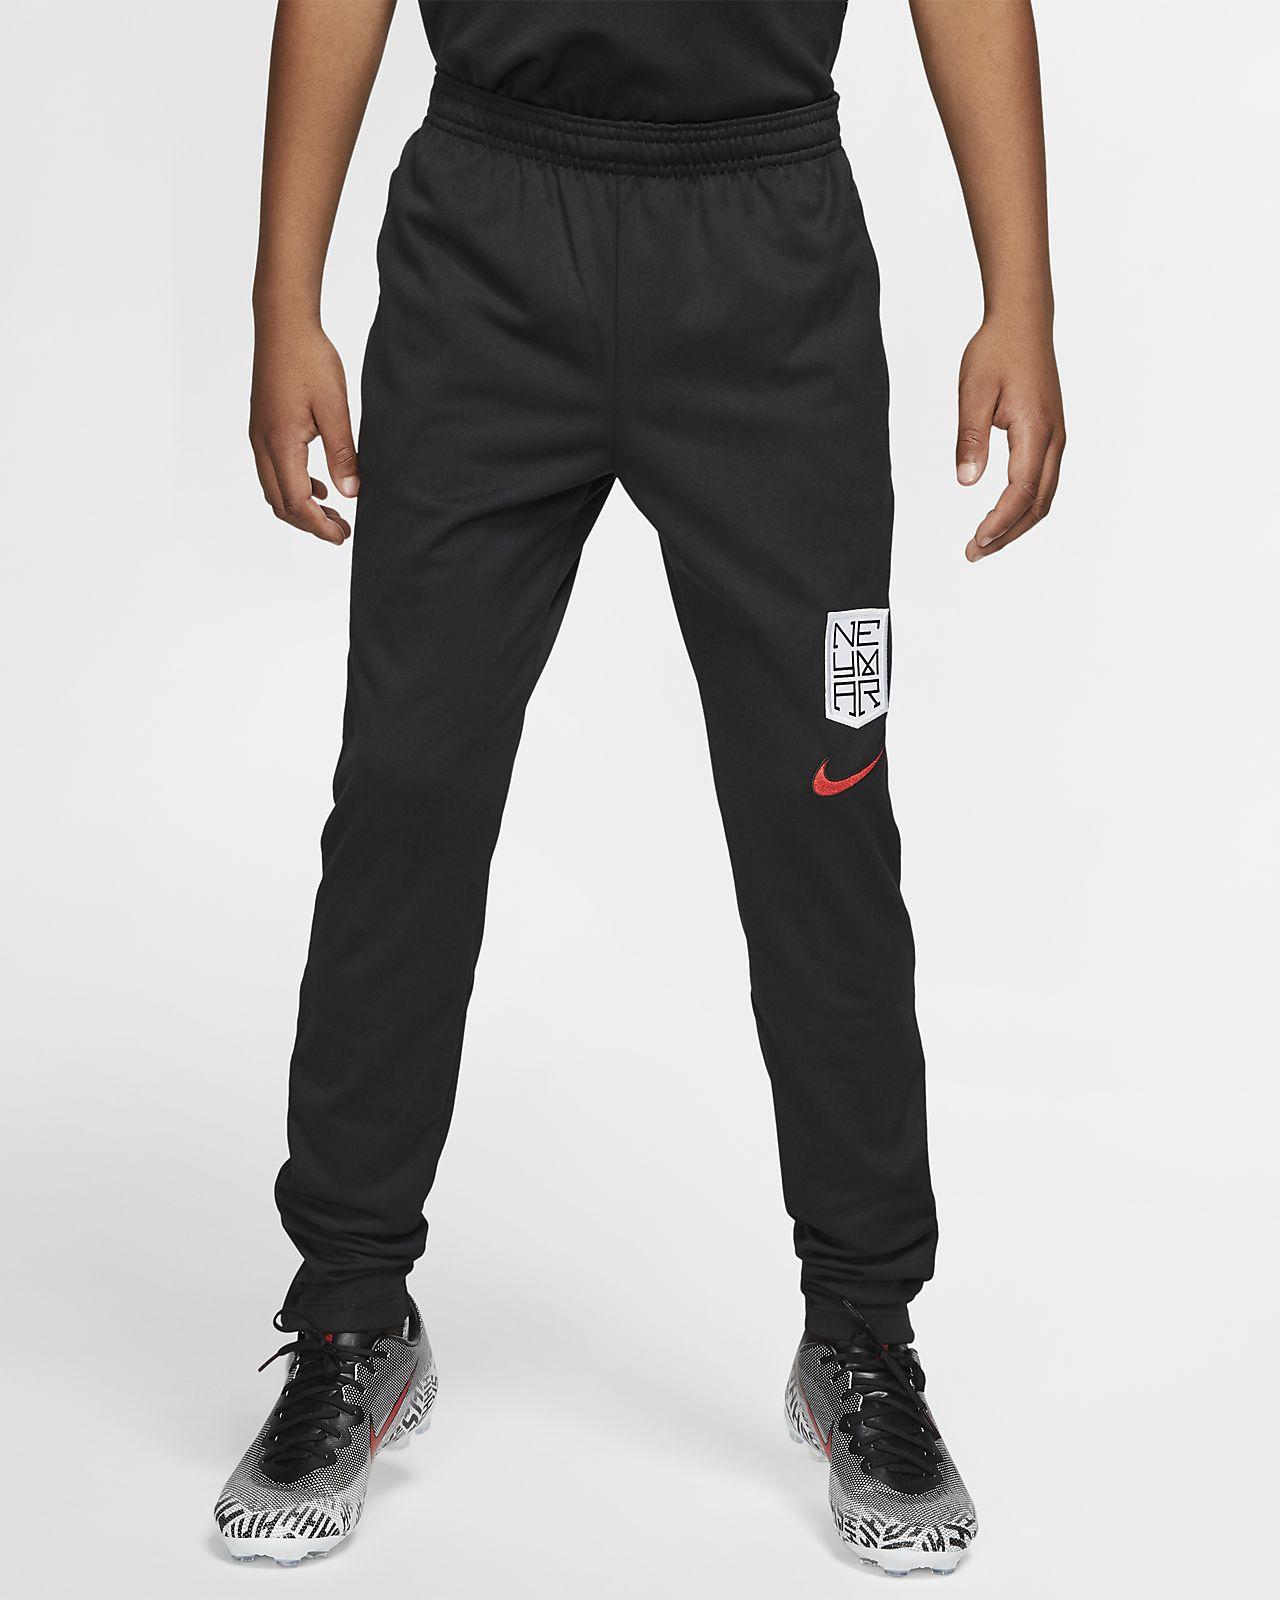 Nike Dri-FIT Neymar Jr. Pantalons de futbol - Nen/a